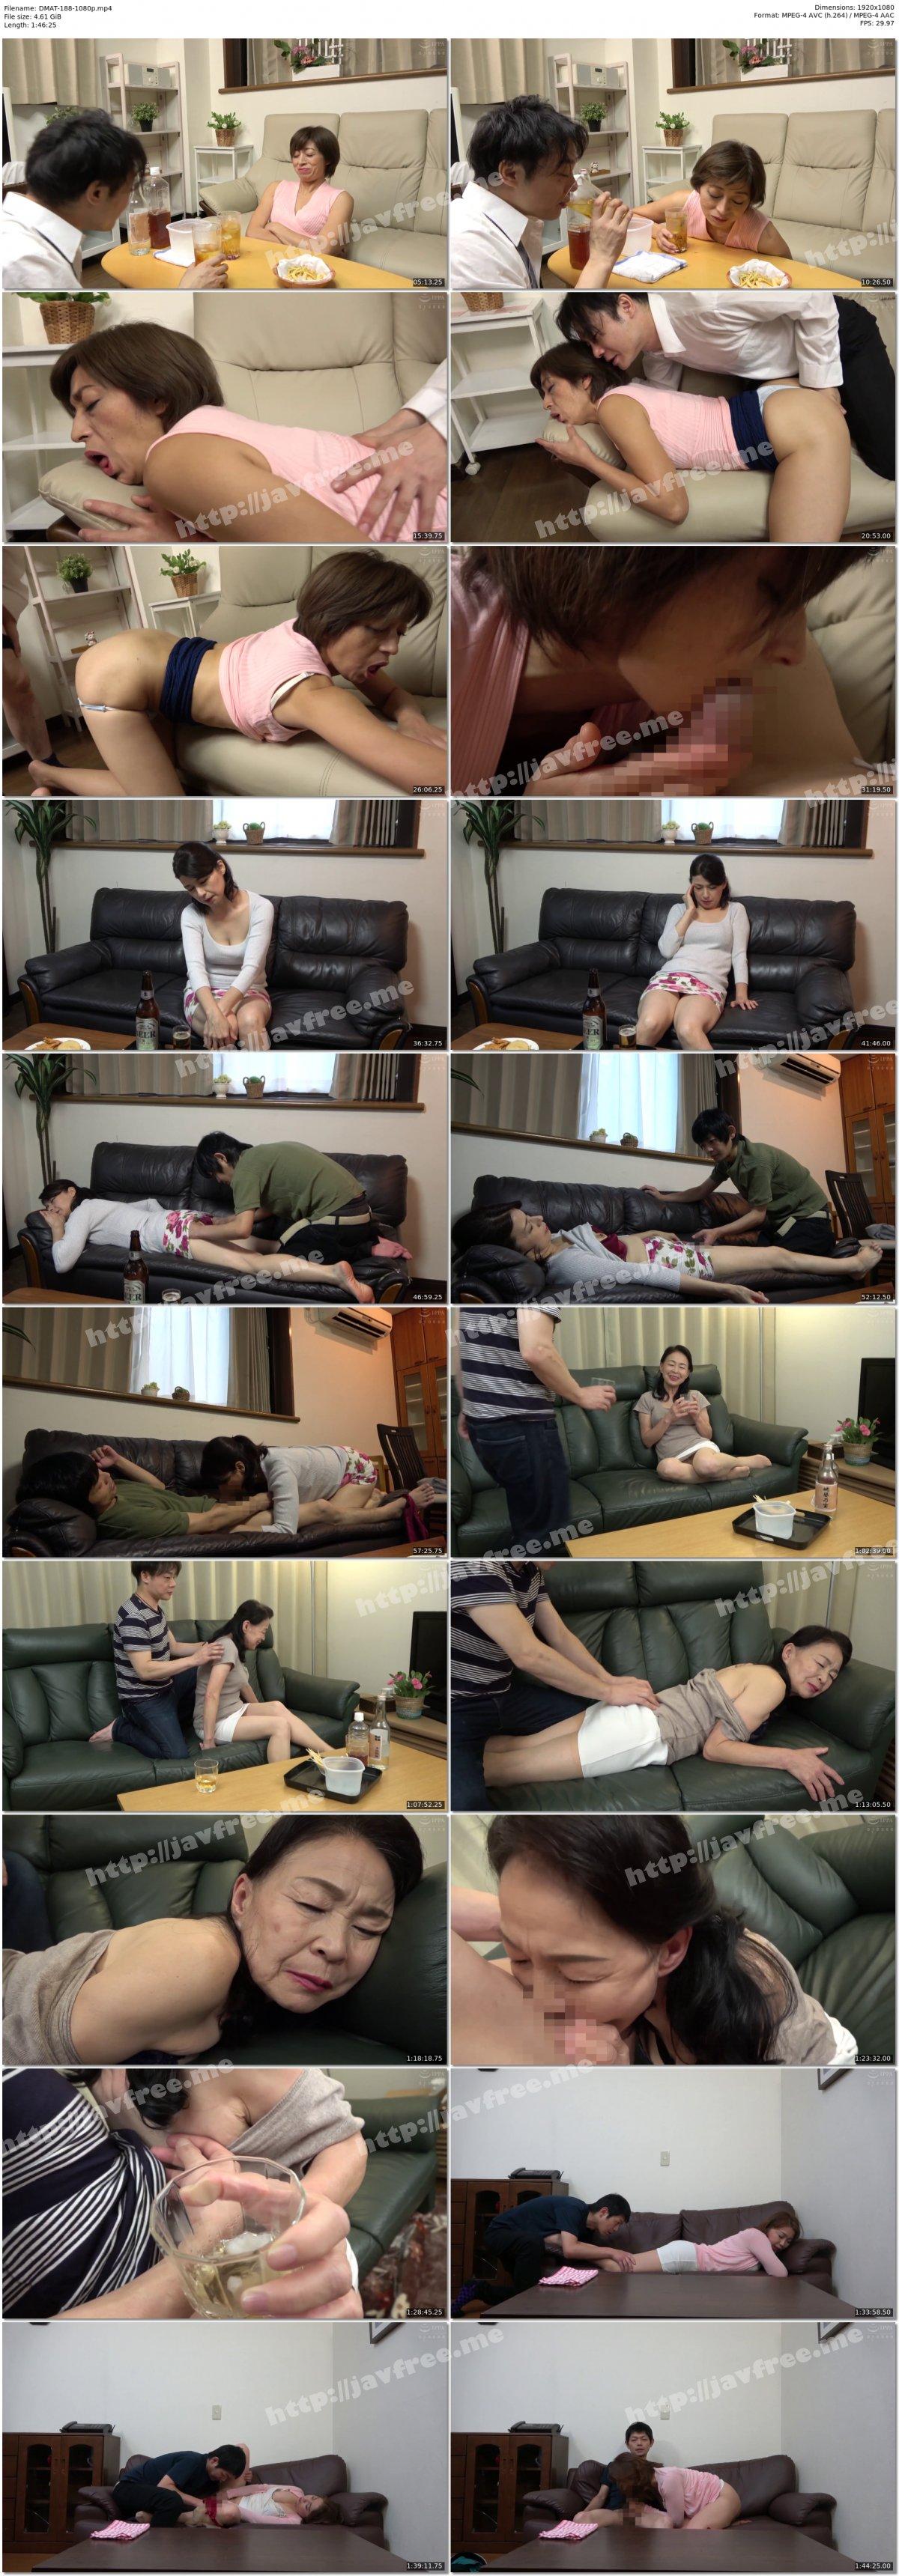 [HD][DMAT-188] 母を酔わせて猥褻マッサージ 異常な息子の主姦映像 - image DMAT-188-1080p on https://javfree.me